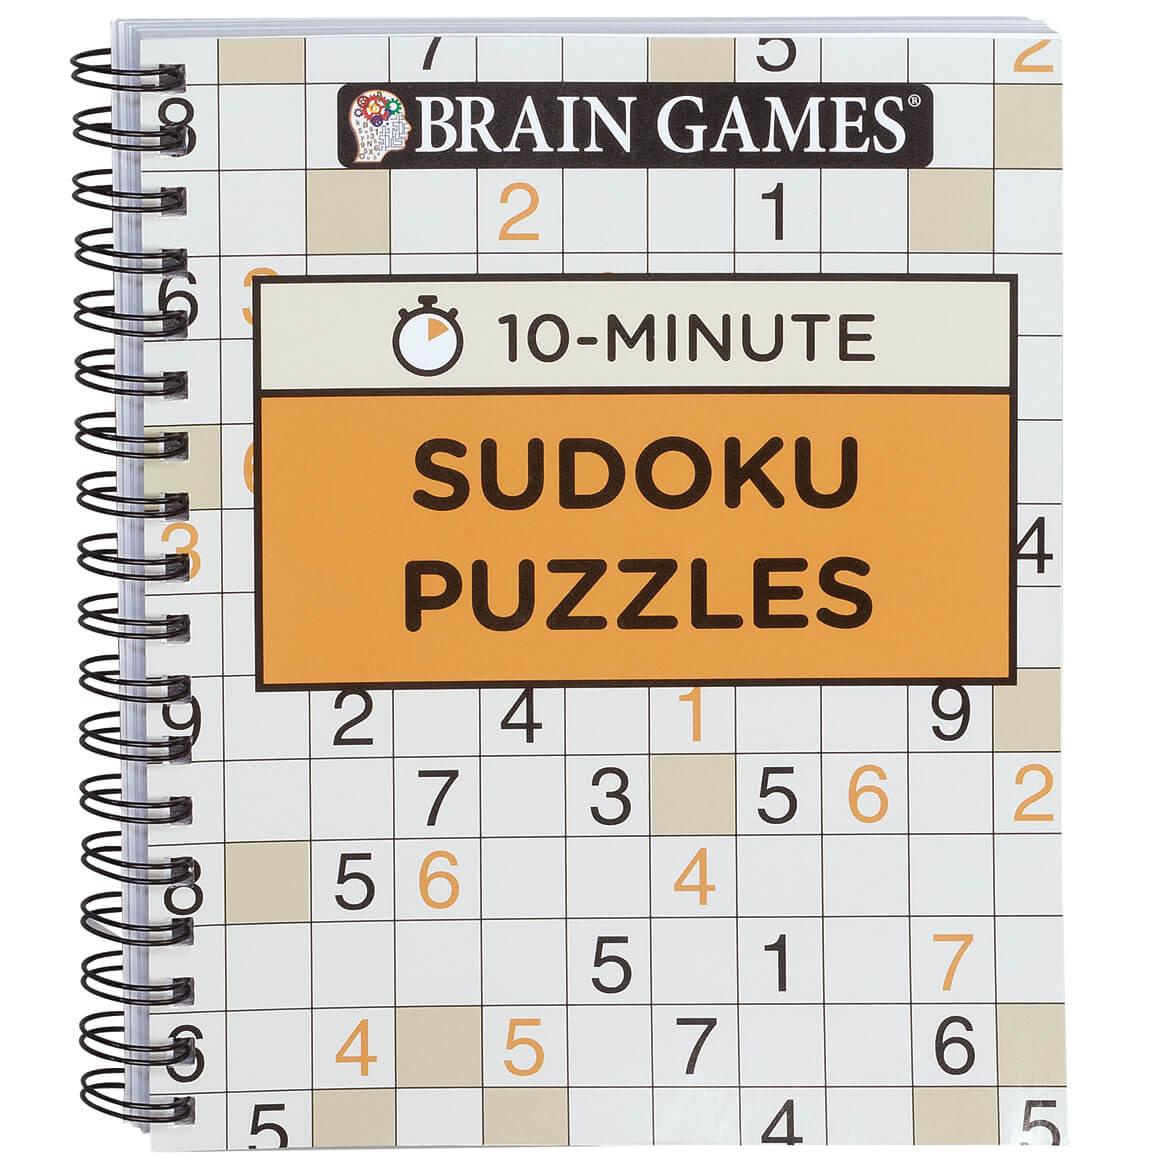 Brain Games® 10-Minute Sudoku Puzzles